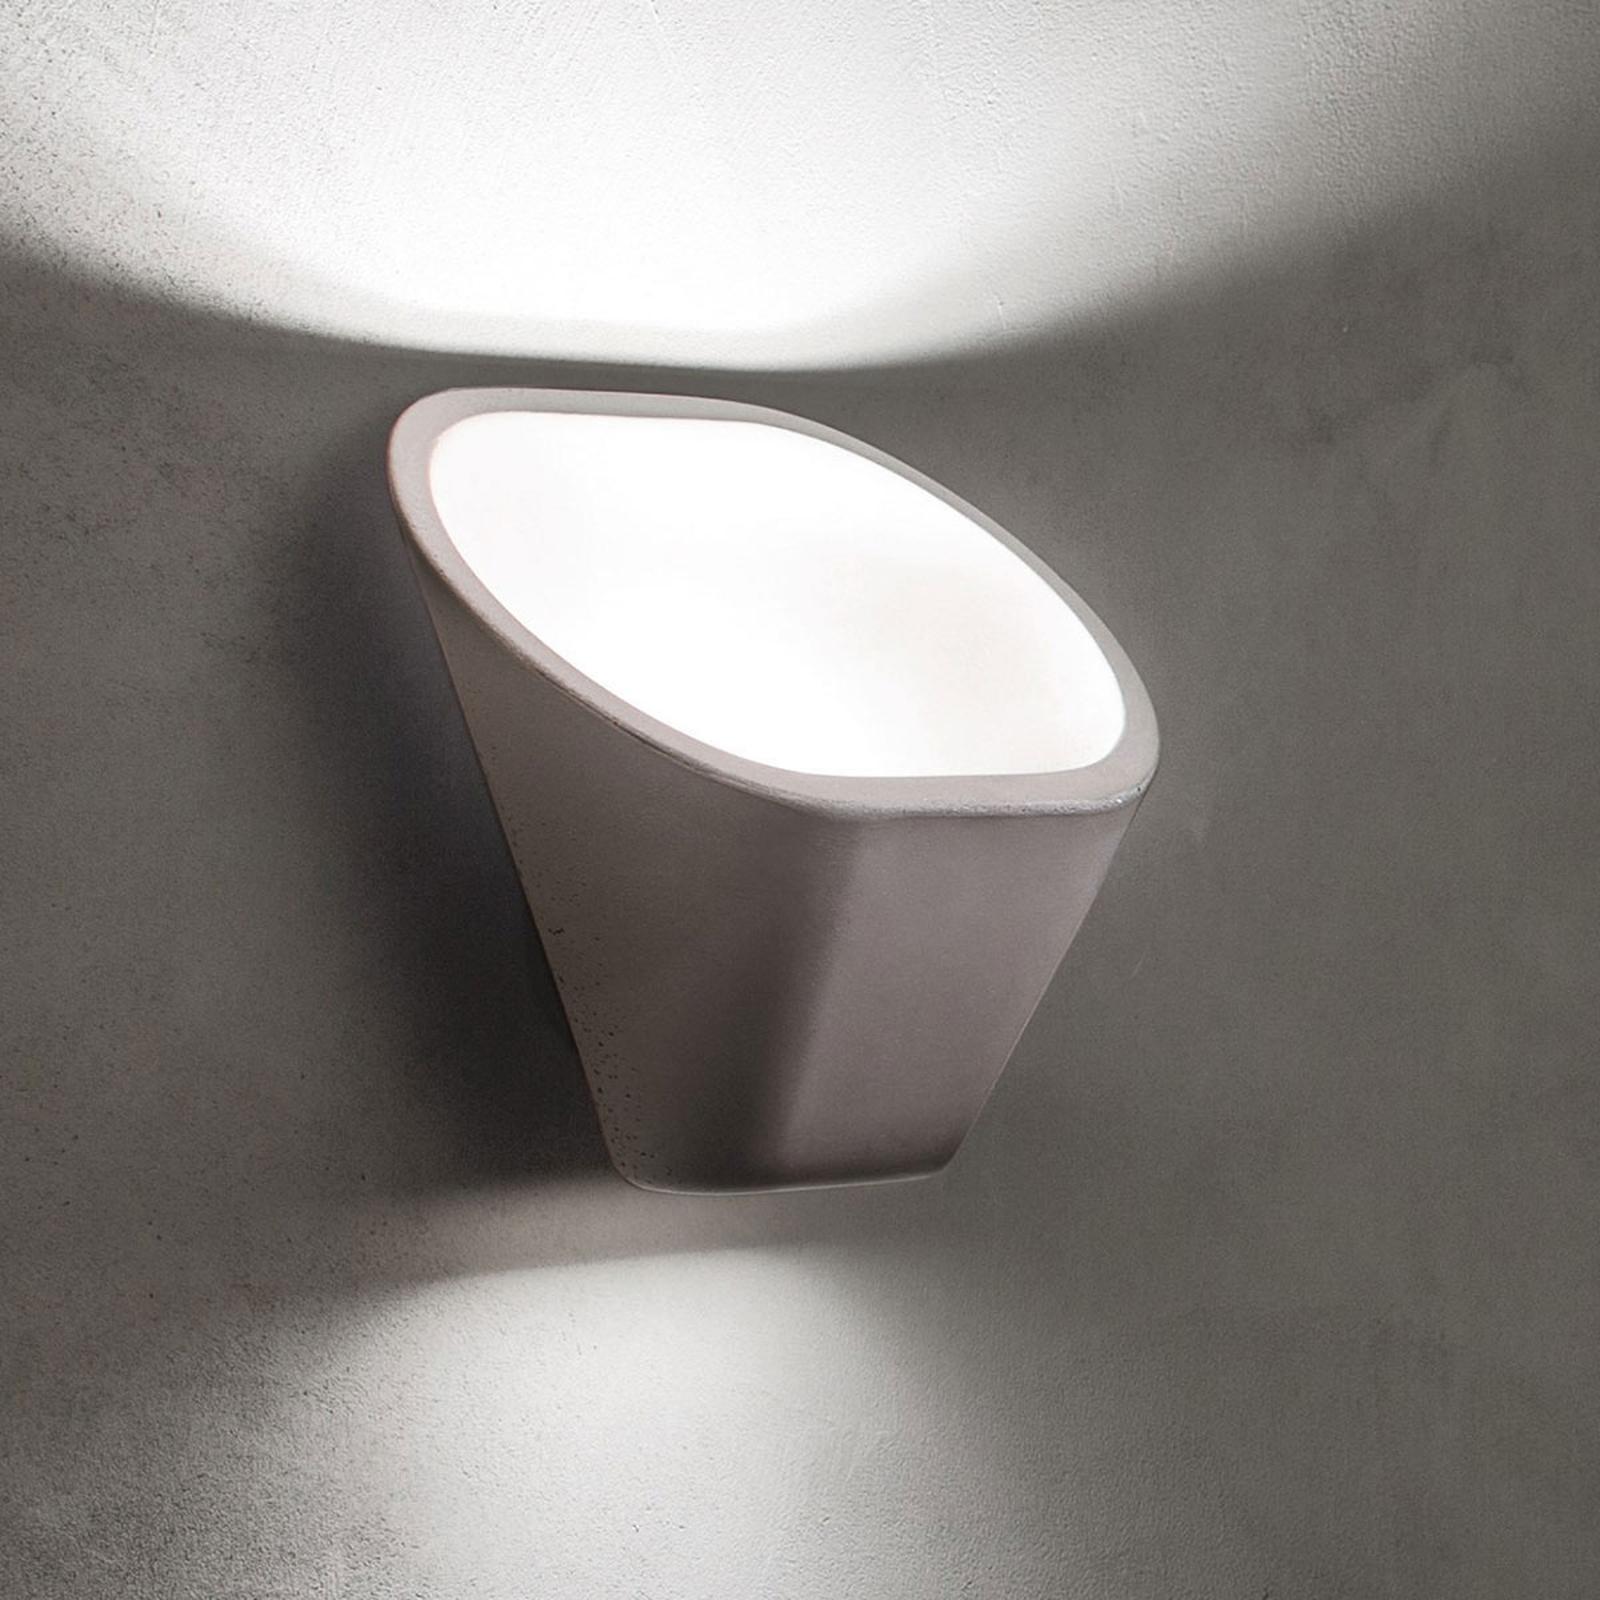 Foscarini Aplomb LED-Wandleuchte, dimmbar, weiß